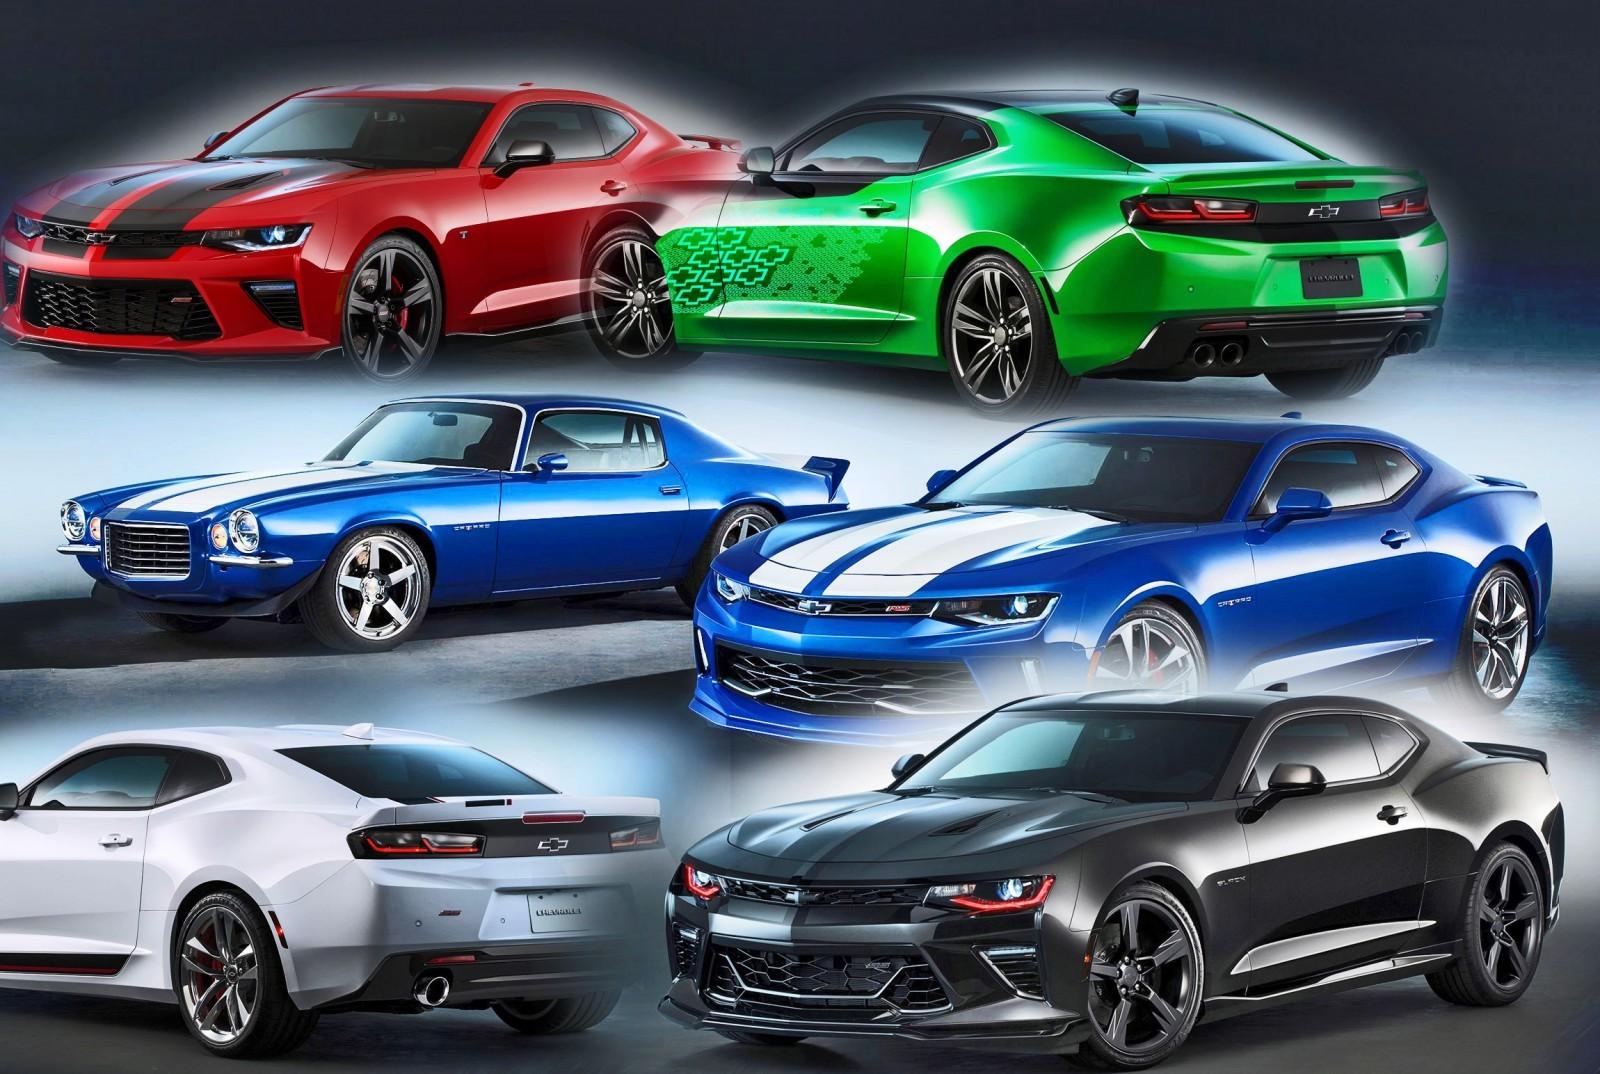 2016 Chevrolet Camaro Colors